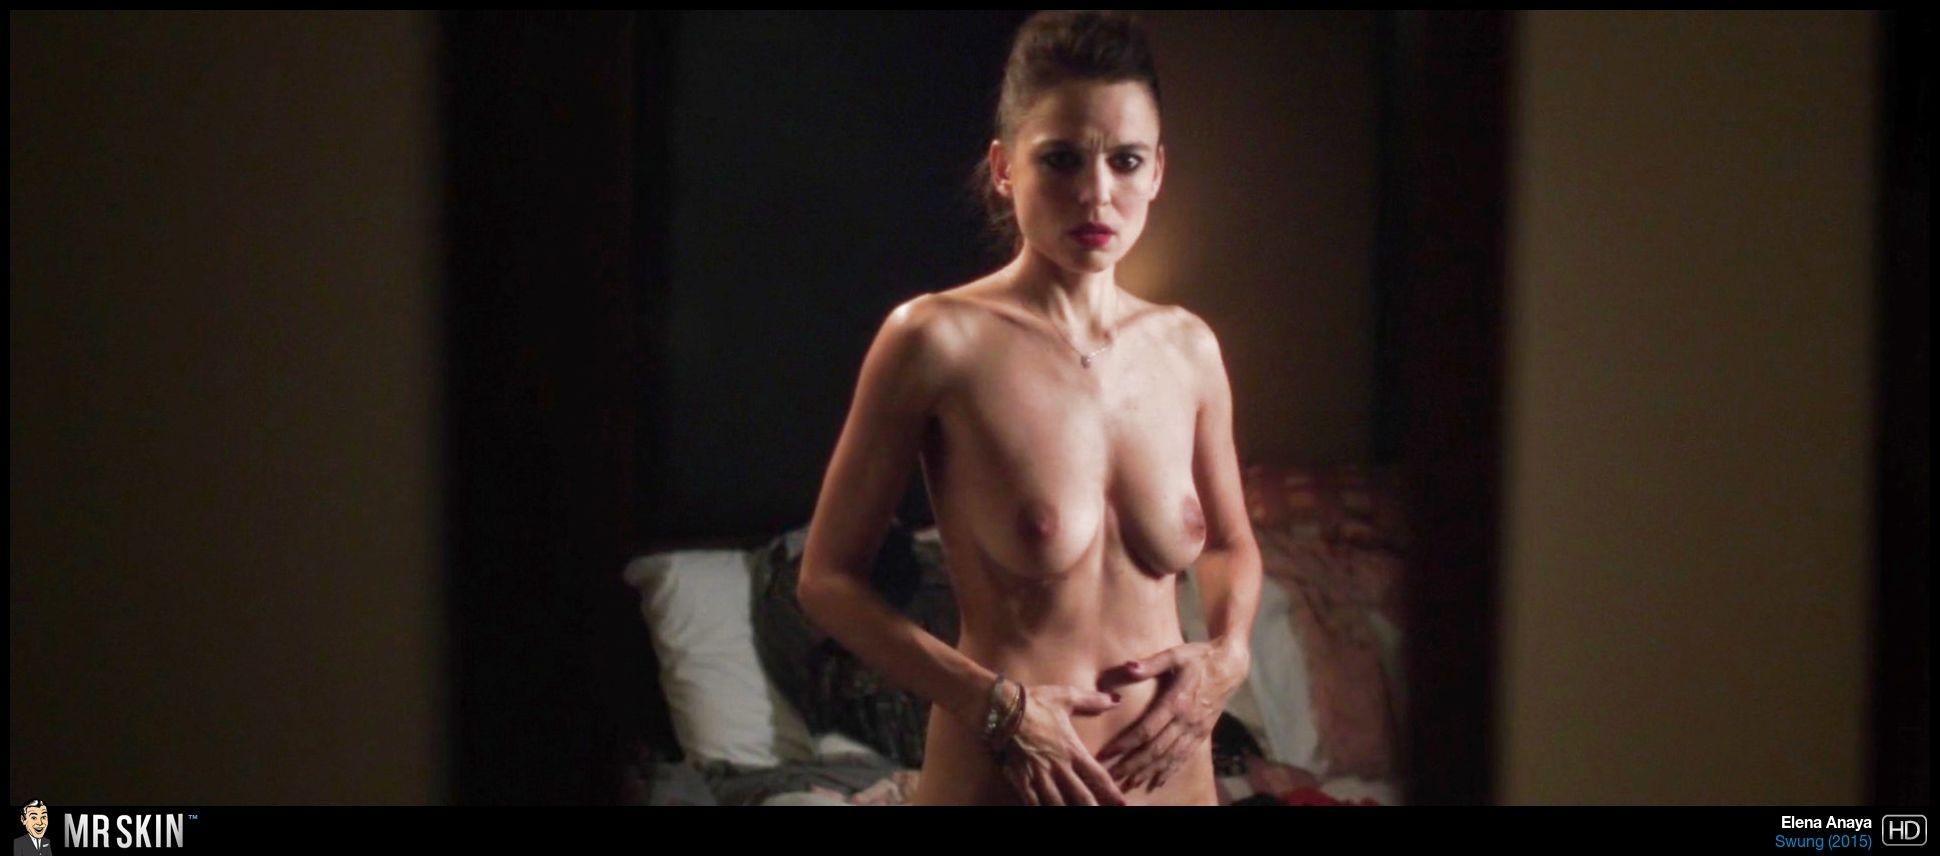 Elena desnuda paparizou foto